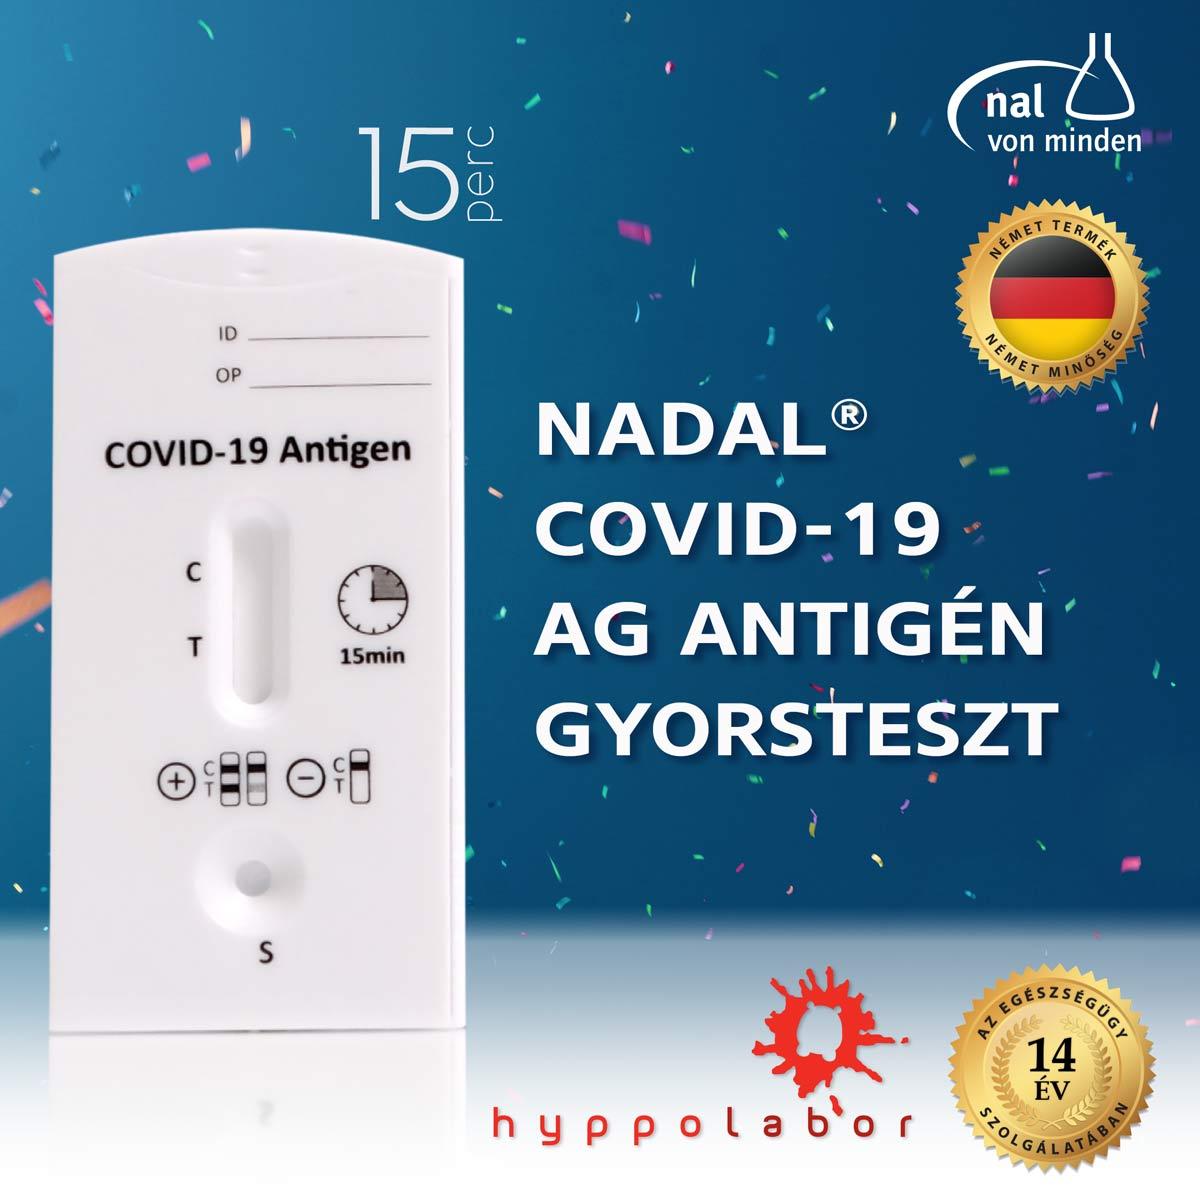 NADAL® COVID-19 AG ANTIGÉN GYORSTESZT - HYPPOLABOR NADAL® COVID-19 Ag antigén gyorsteszt